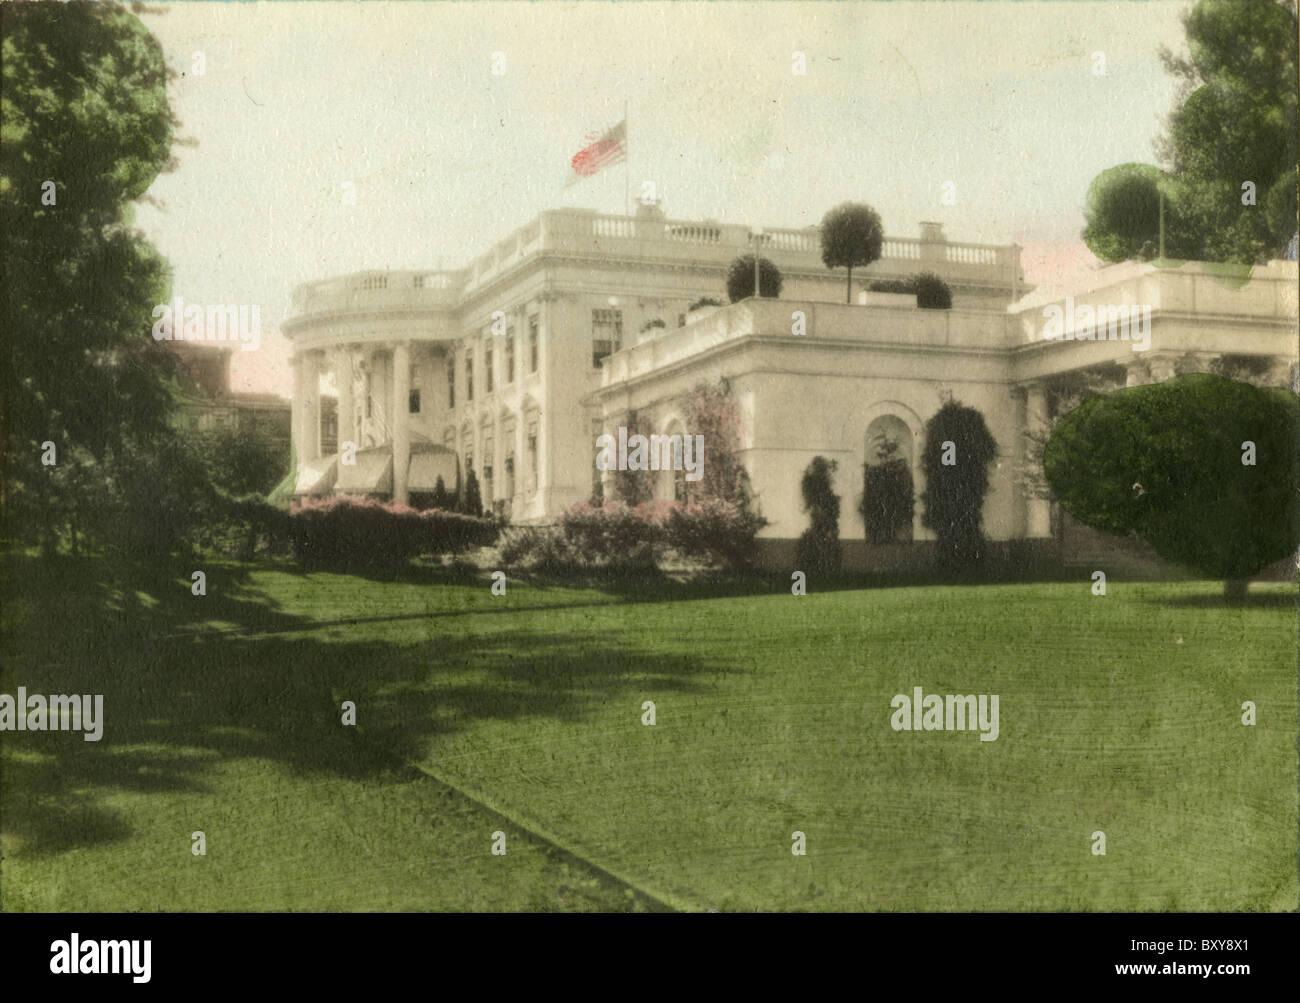 Circa 1910s hand-tinted photograph of The White House, Washington DC, USA. - Stock Image